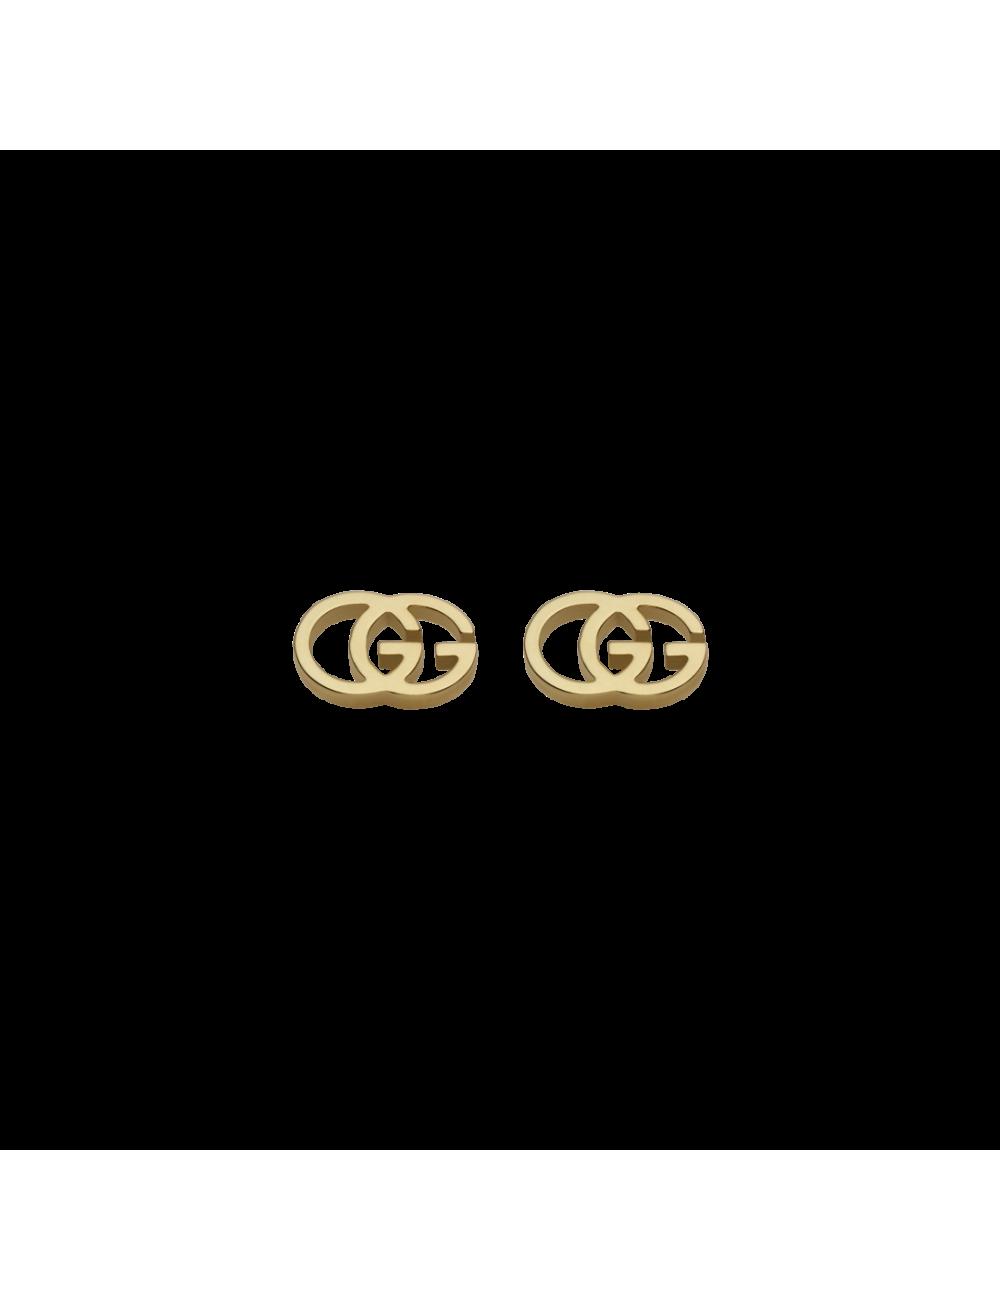 Gucci -Pendientes Gucci GG de Oro amarillo -YBD09407400200U